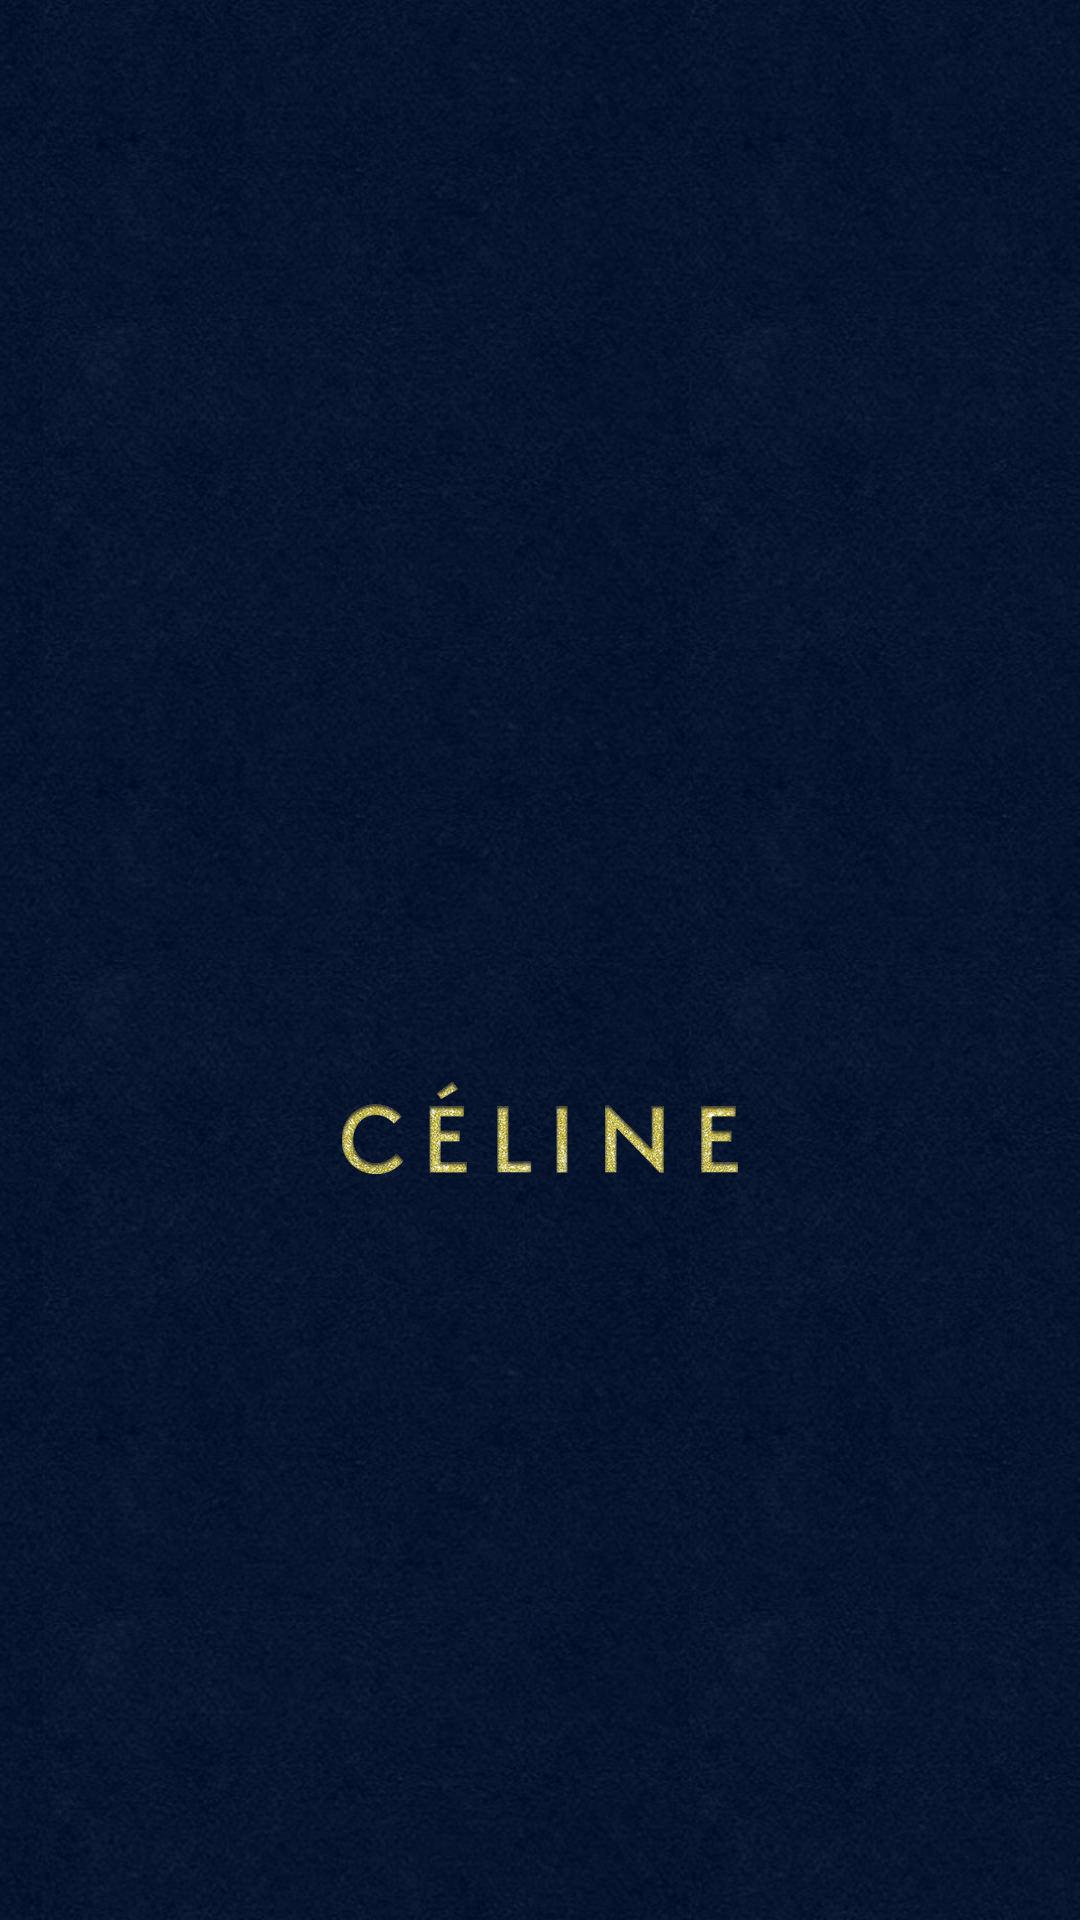 celine07